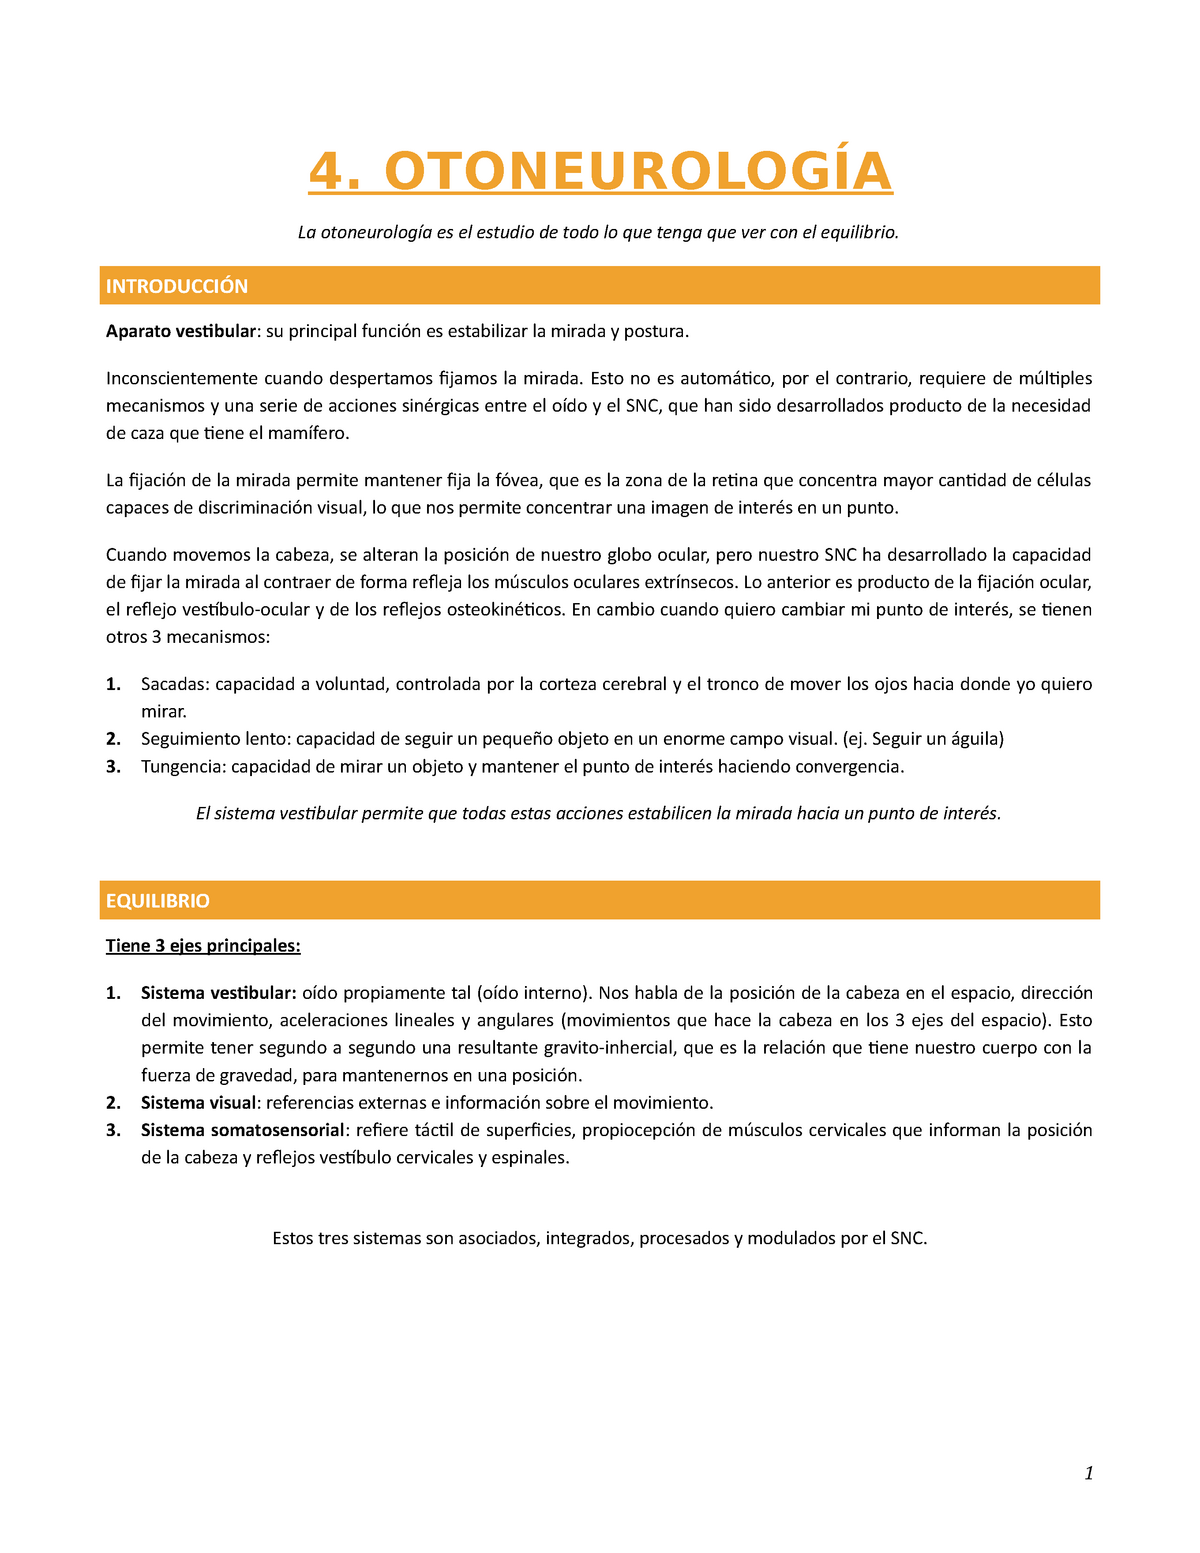 Patologia: Otoneurologia - Otorrinolaringologia - U Mayor